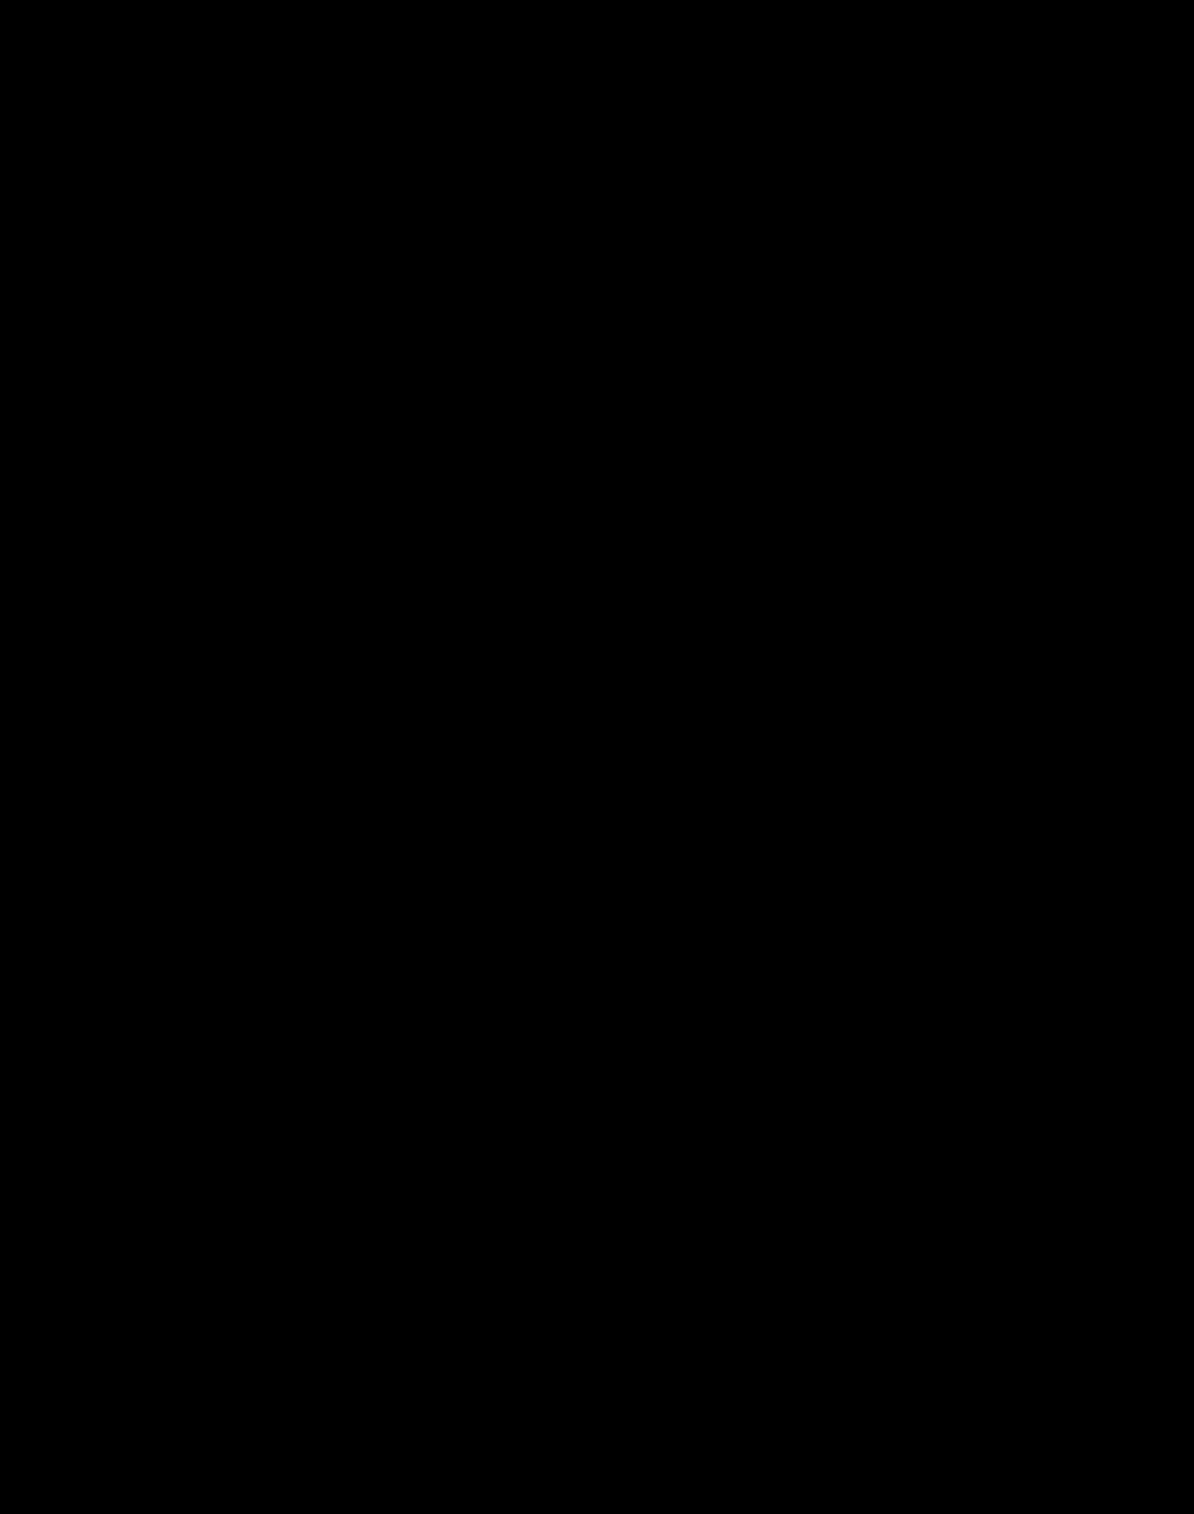 ELEANOR & COLETTE – JETZT ALS DIGITALER DOWNLOAD VERFÜGBAR